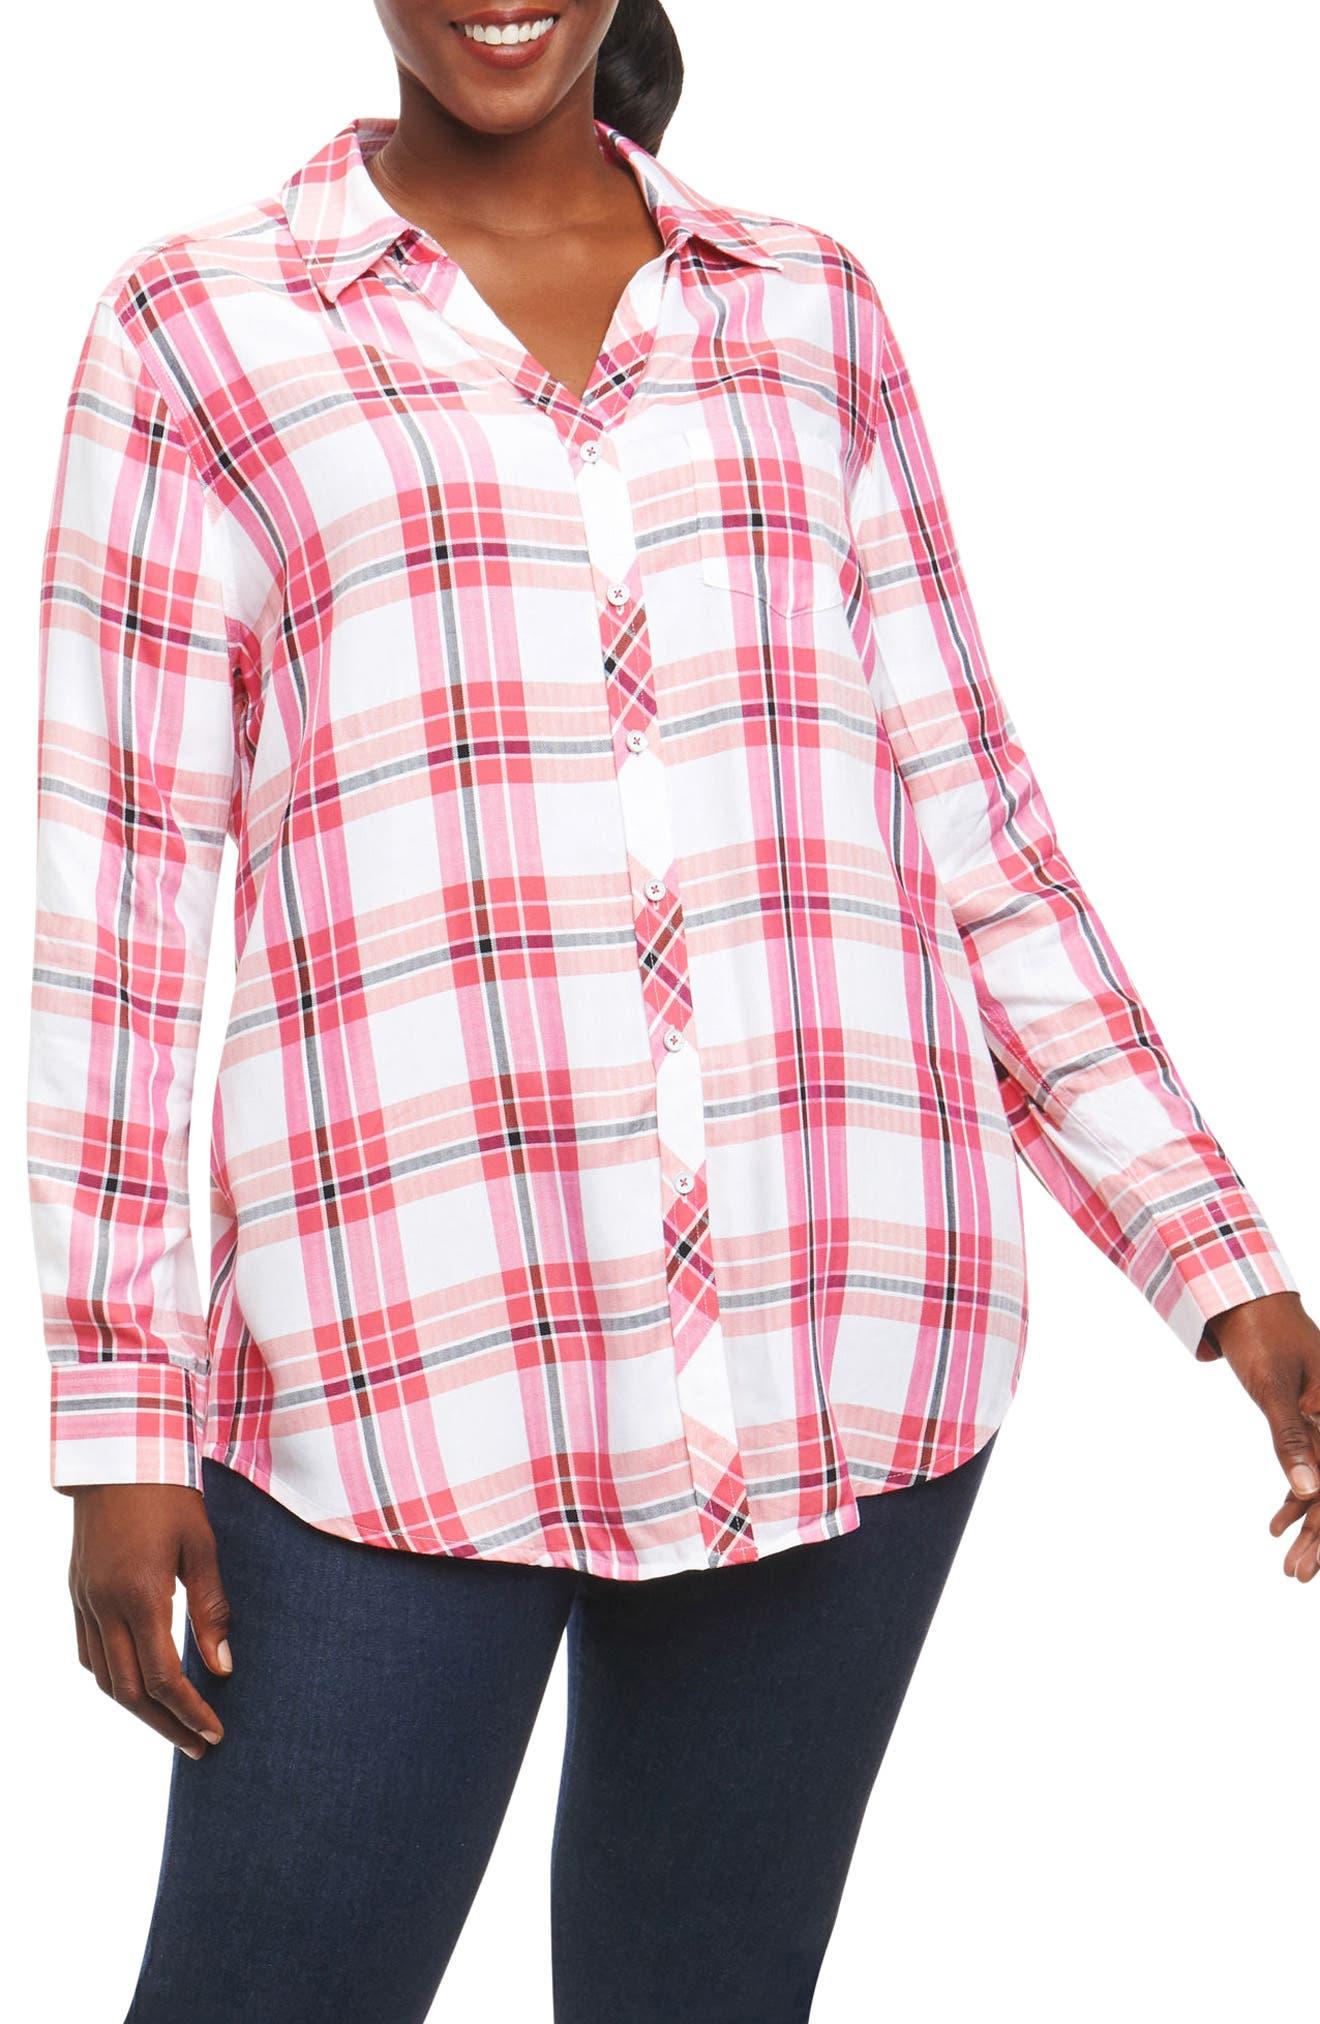 Main Image - Foxcroft Fay Plaid Shirt (Plus Size)